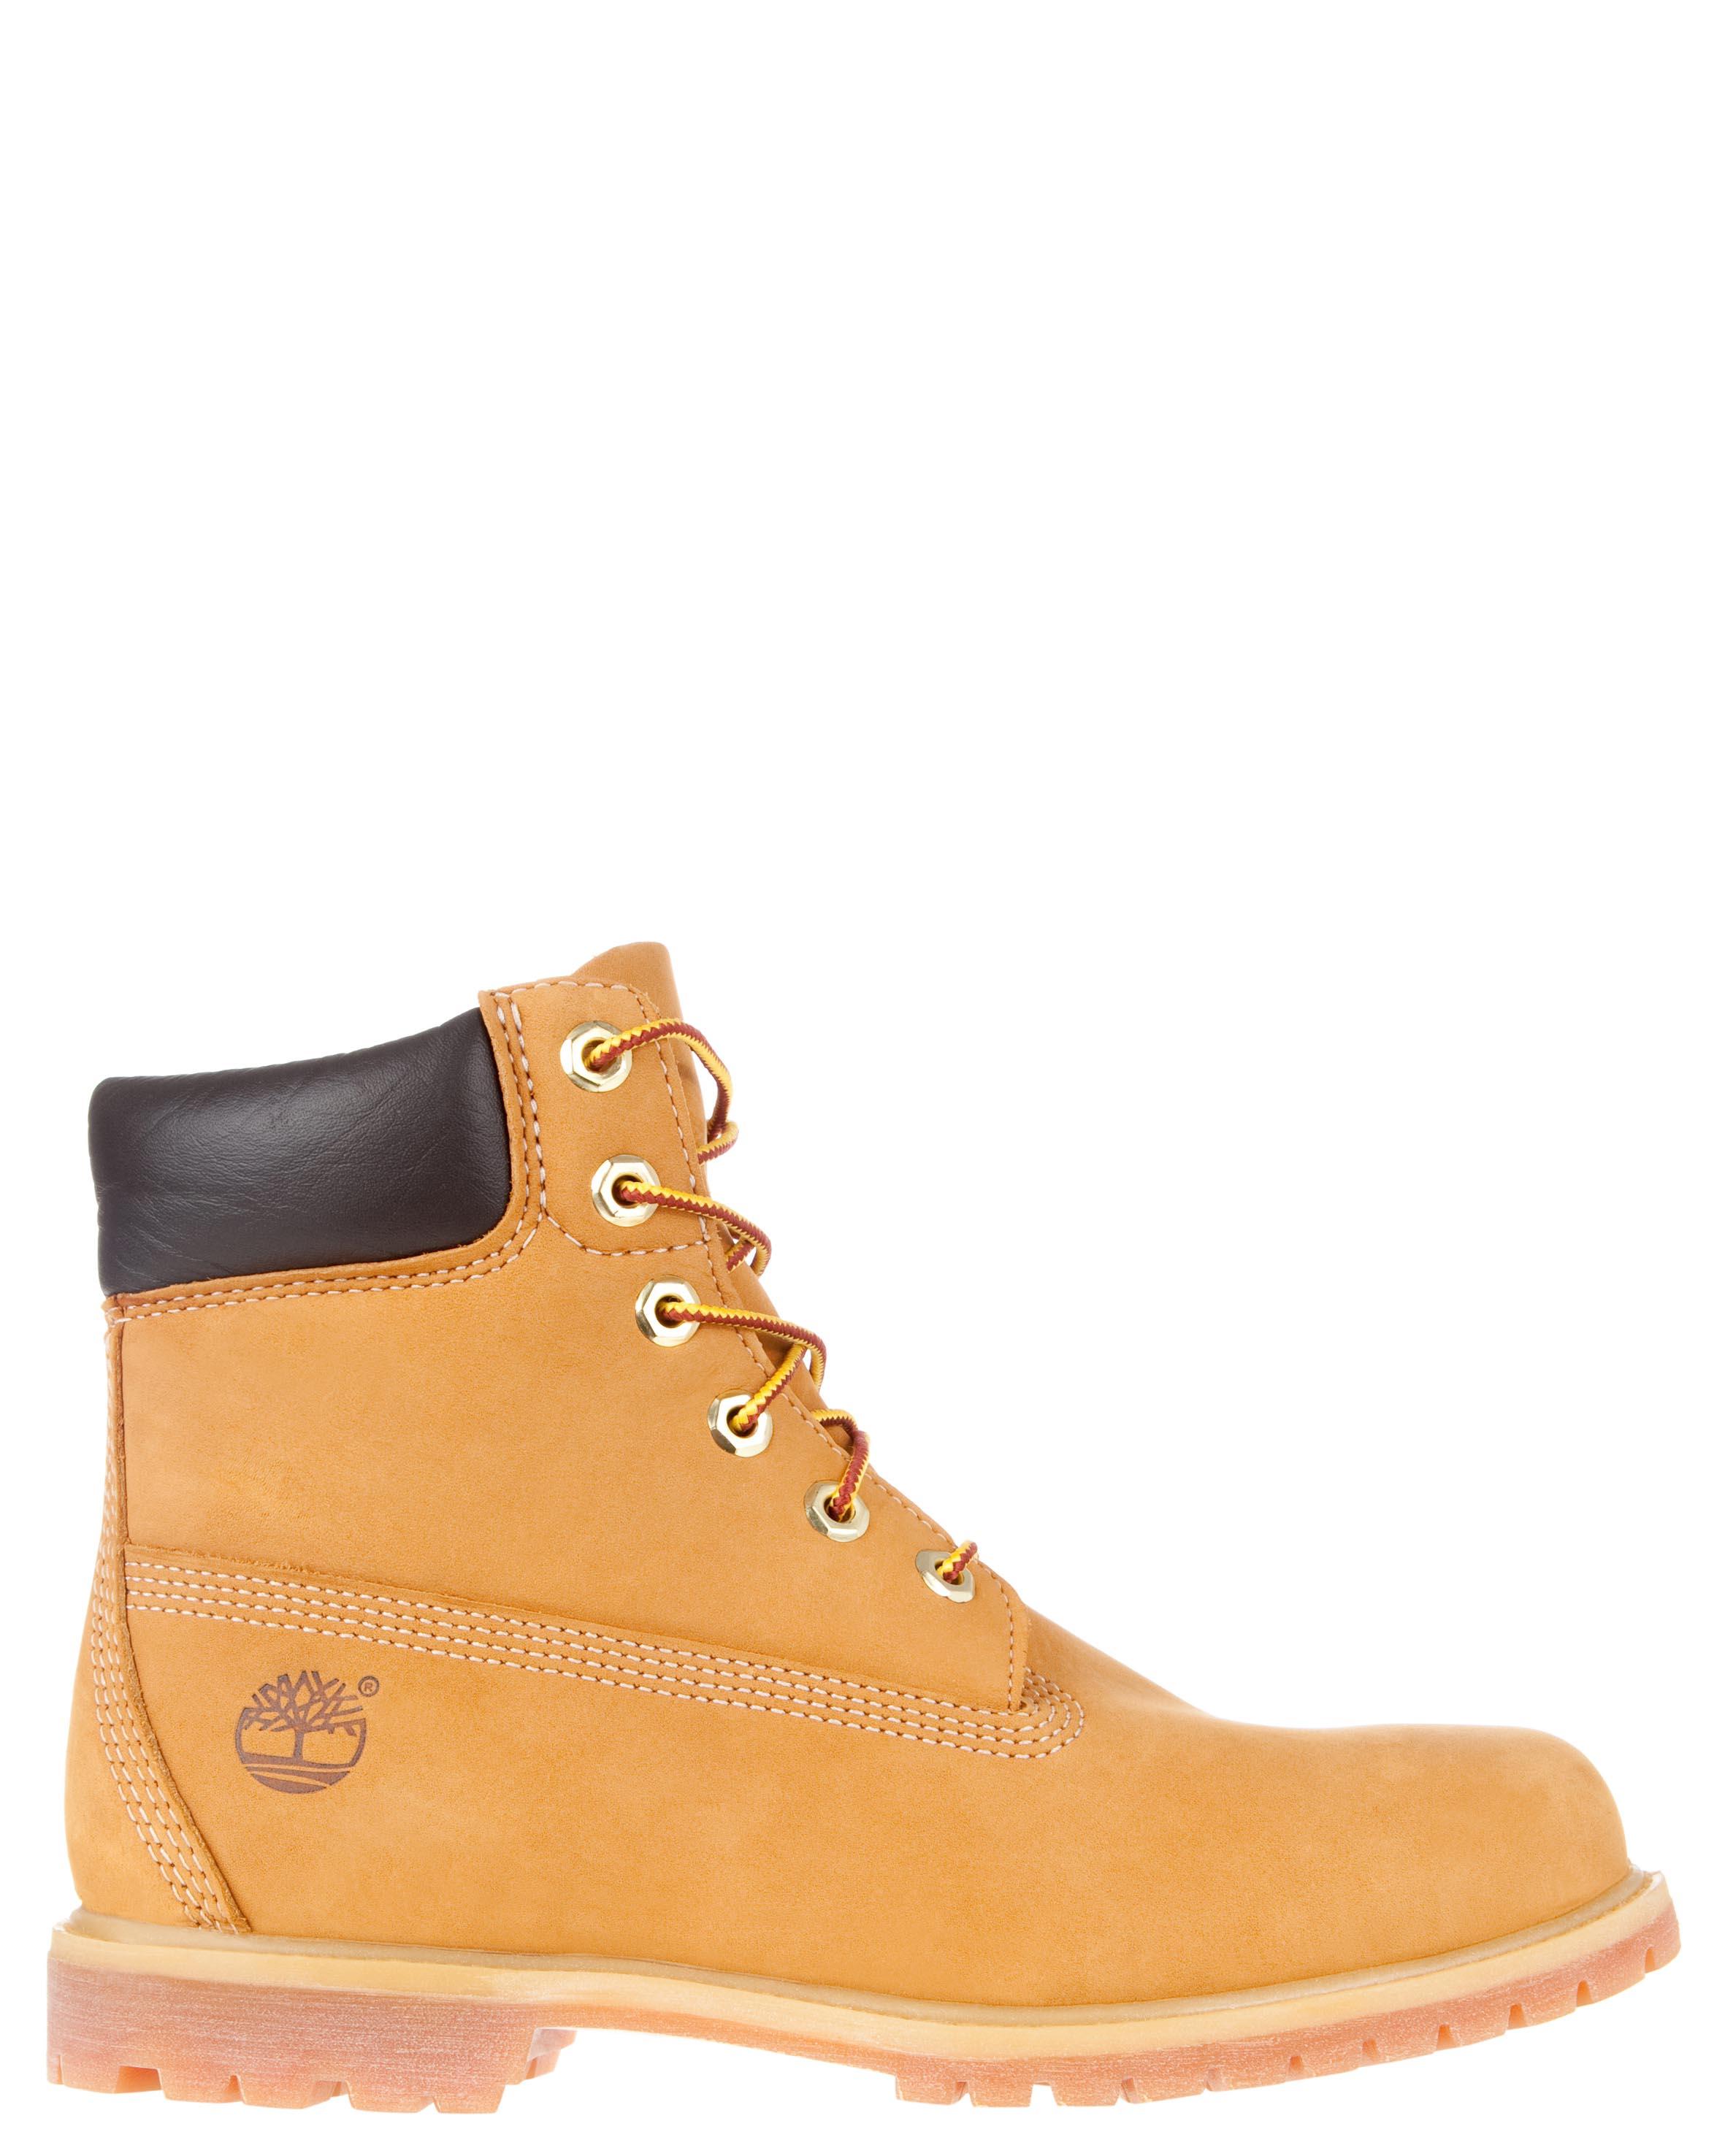 timberland womens boots australia